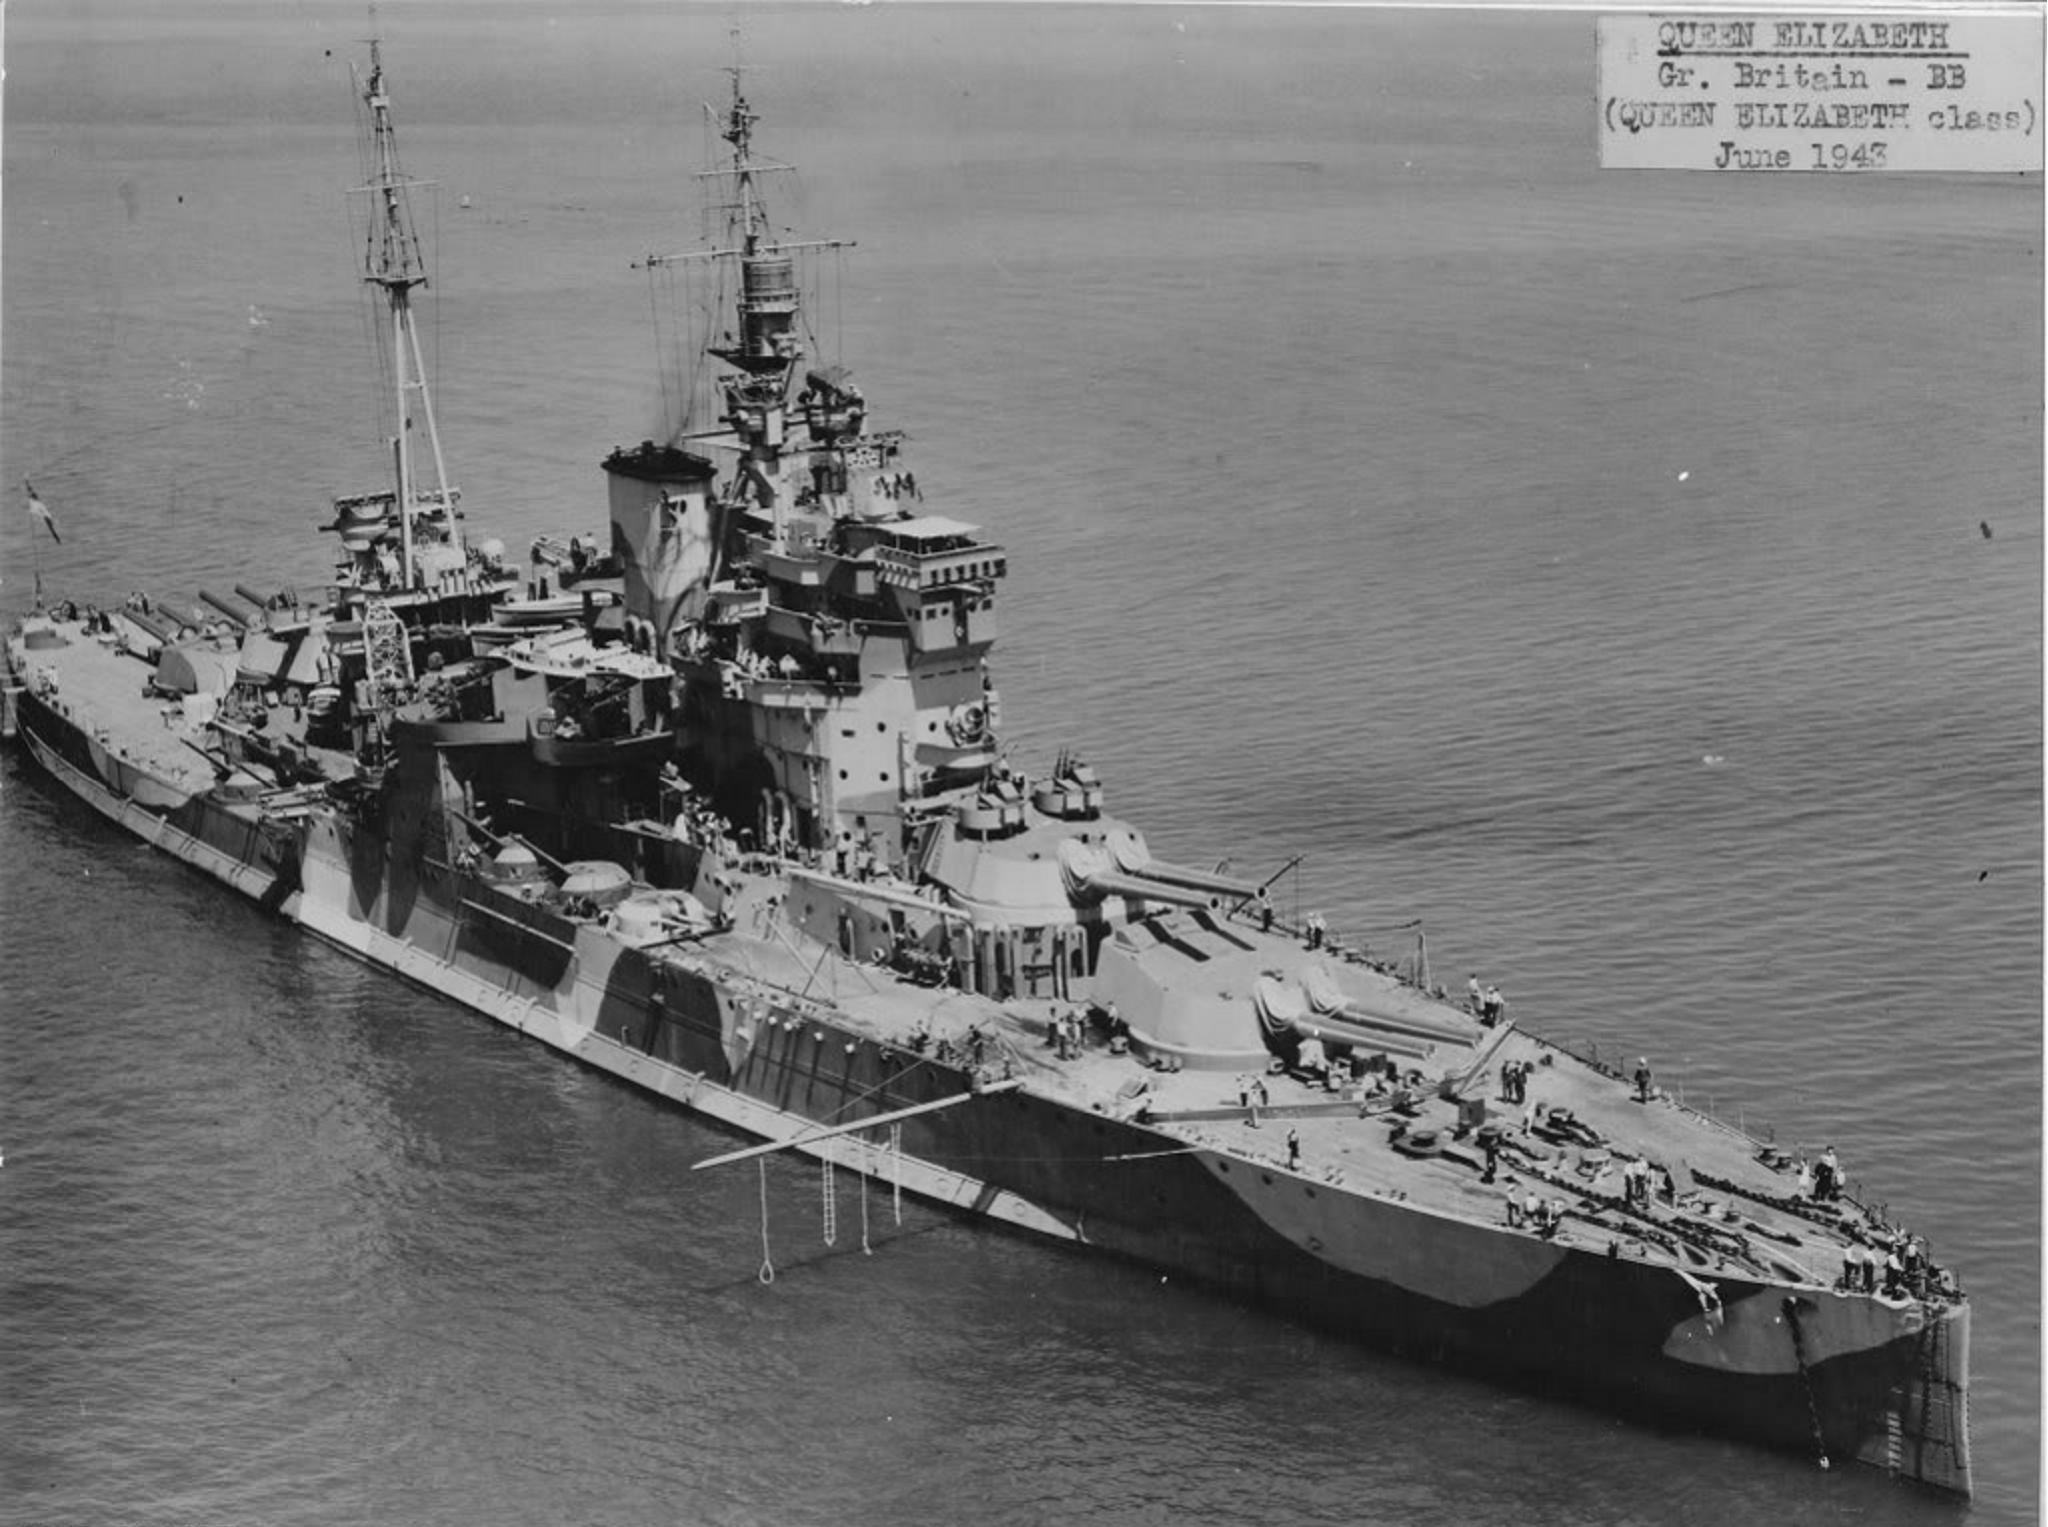 HMS_Queen_Elizabeth_09_1943.jpg